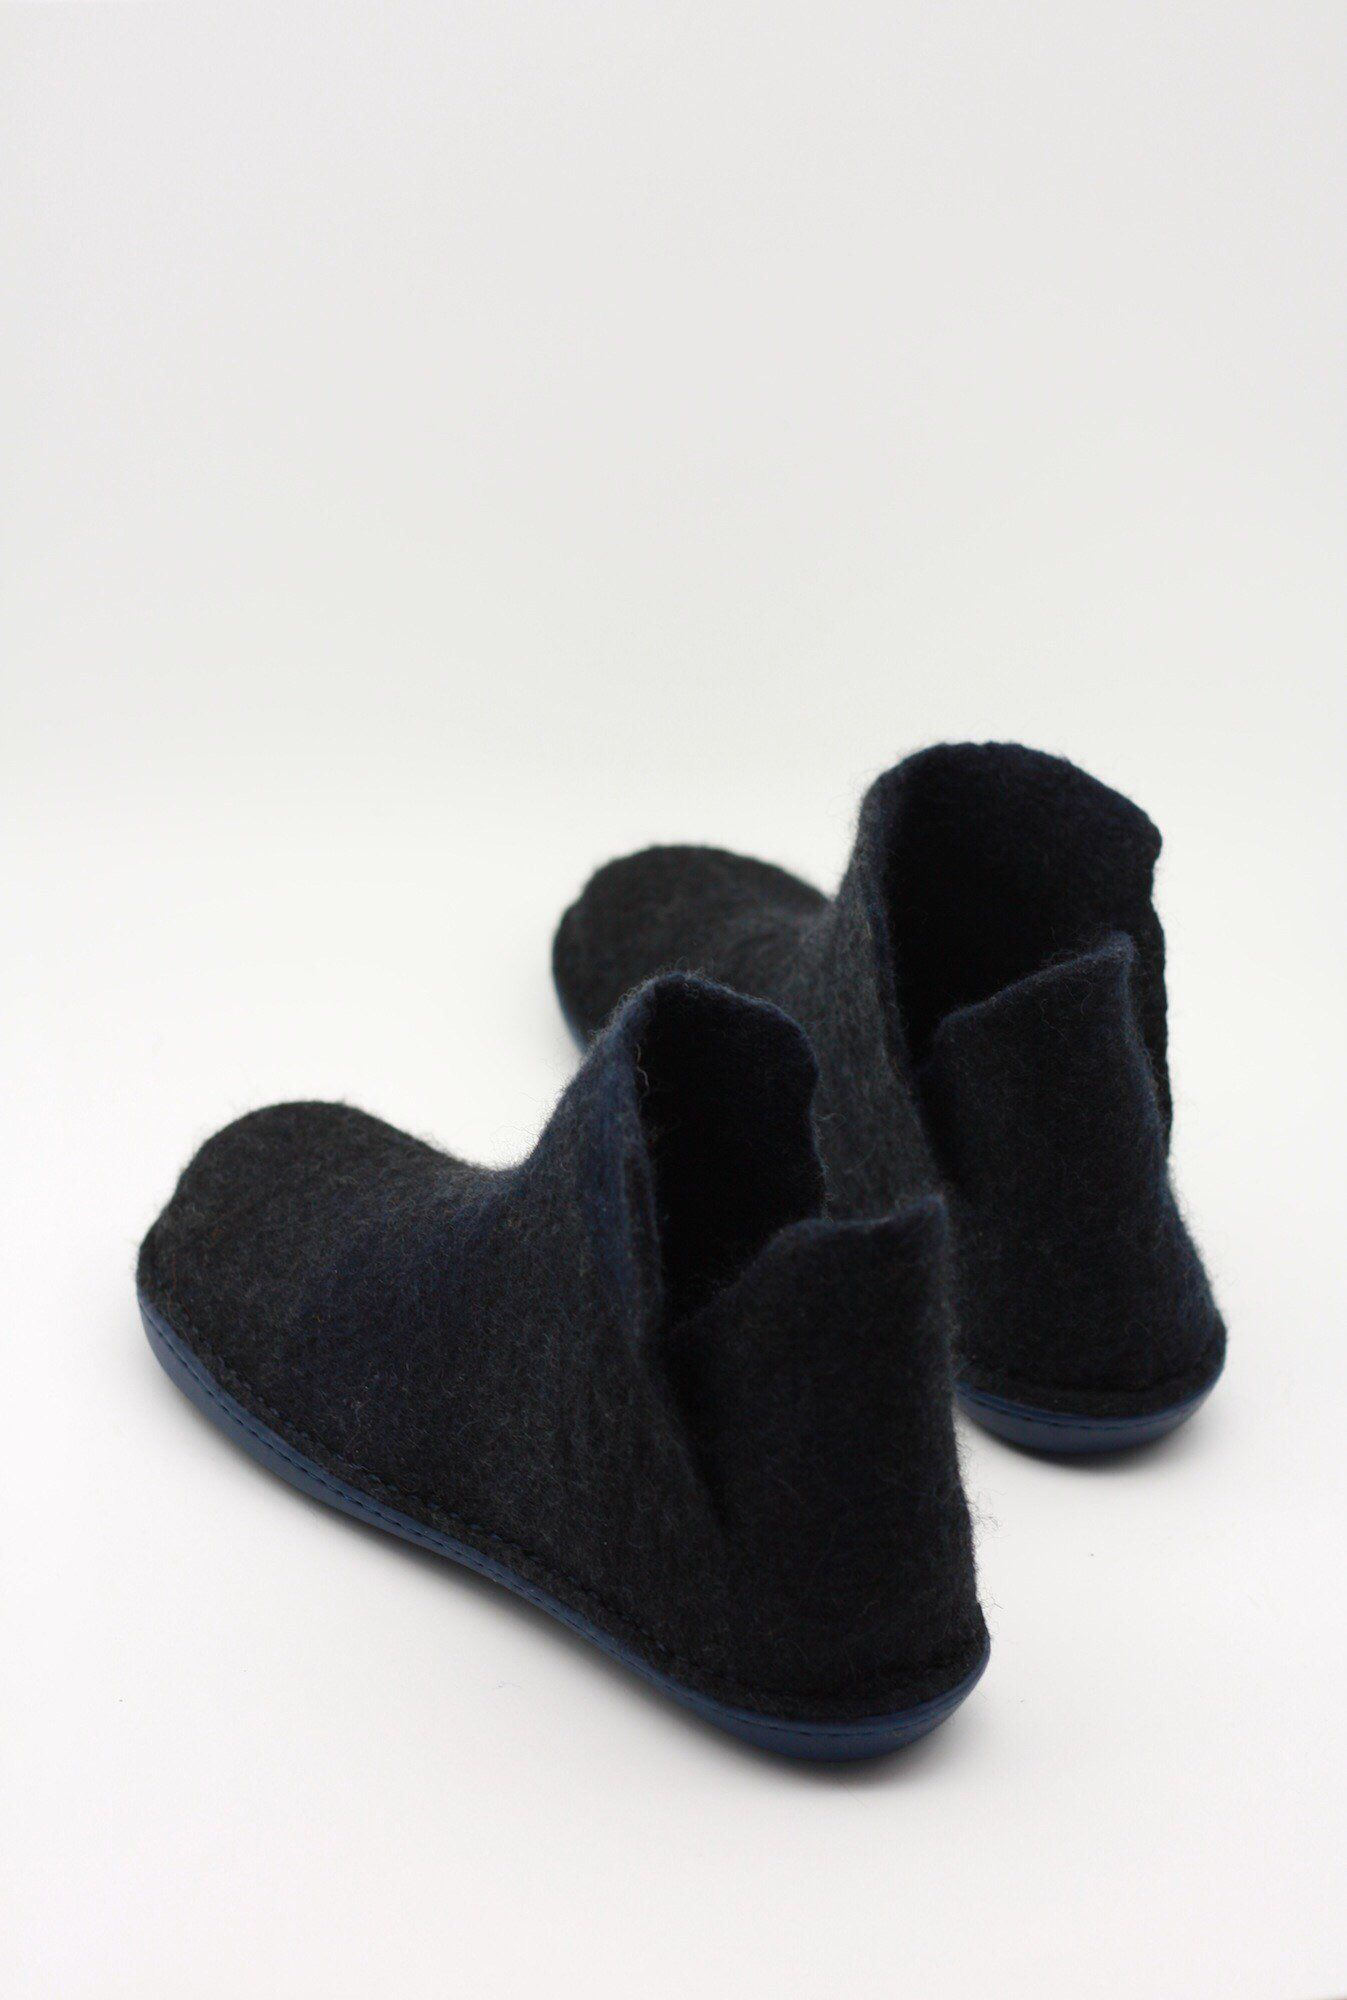 e91ae92f7bf77 LUCIELALUNE black ankle boots for men handmade felted merino wool ...